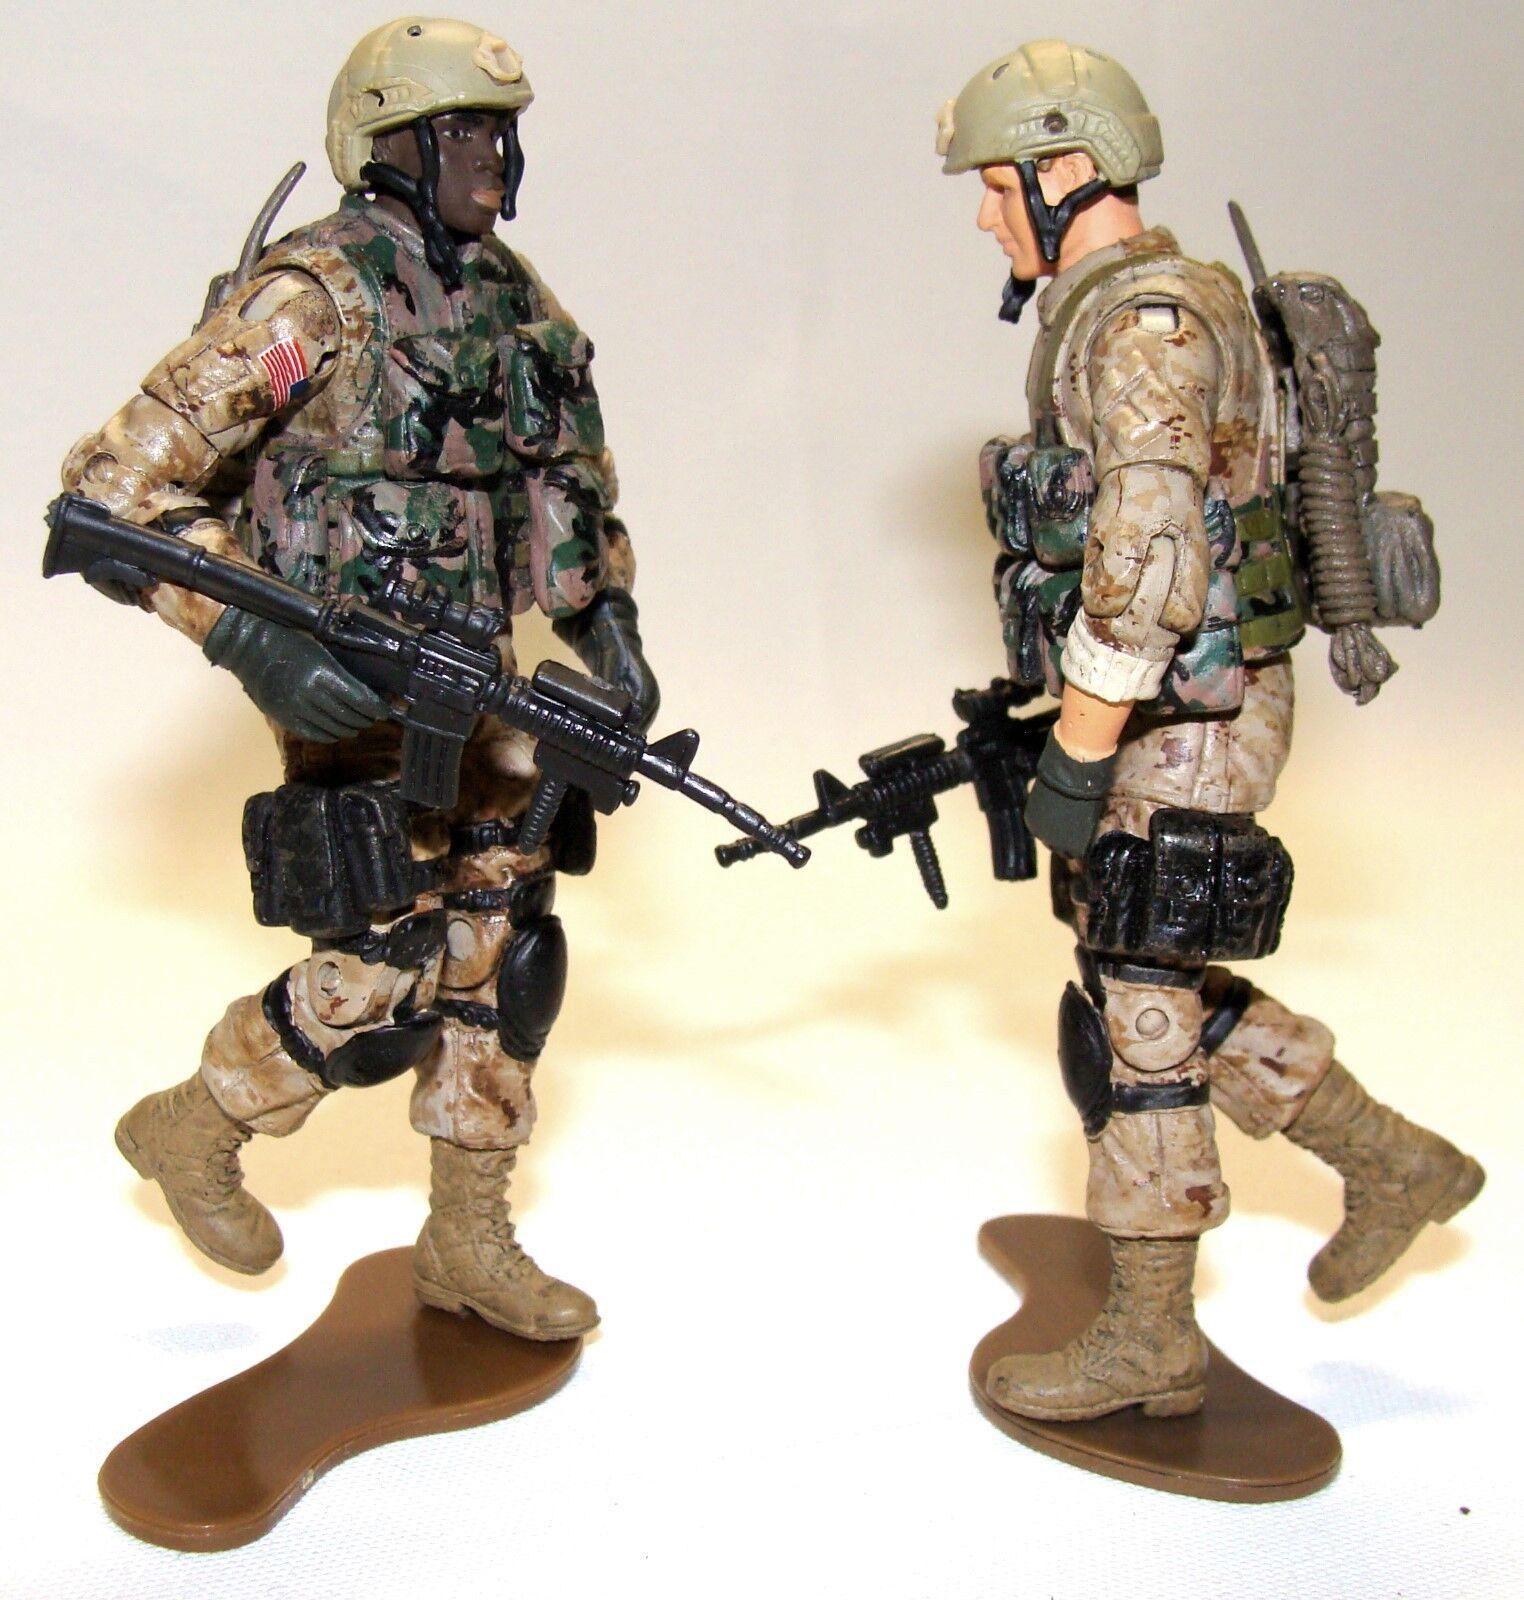 Elite Force 1 18 Toy : Unimax bbi elite force u s special forces figure seal